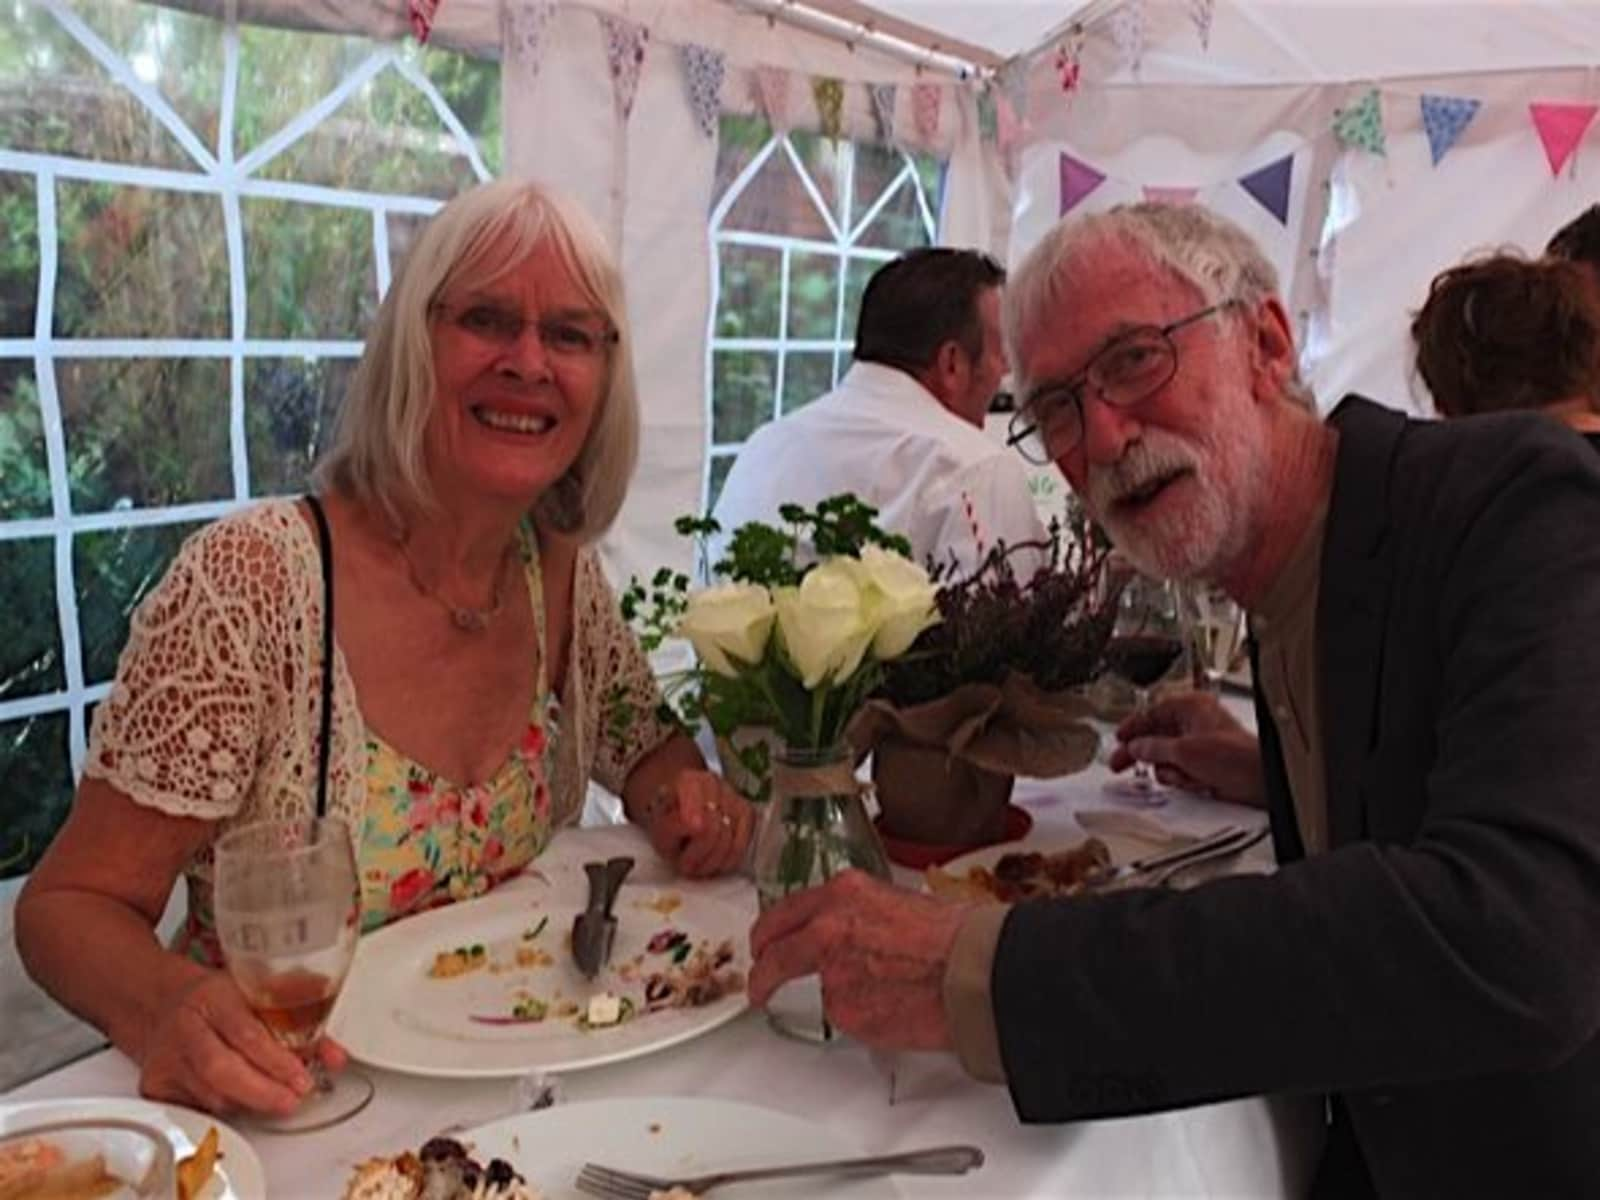 Liz & Peter from Cornillon, France